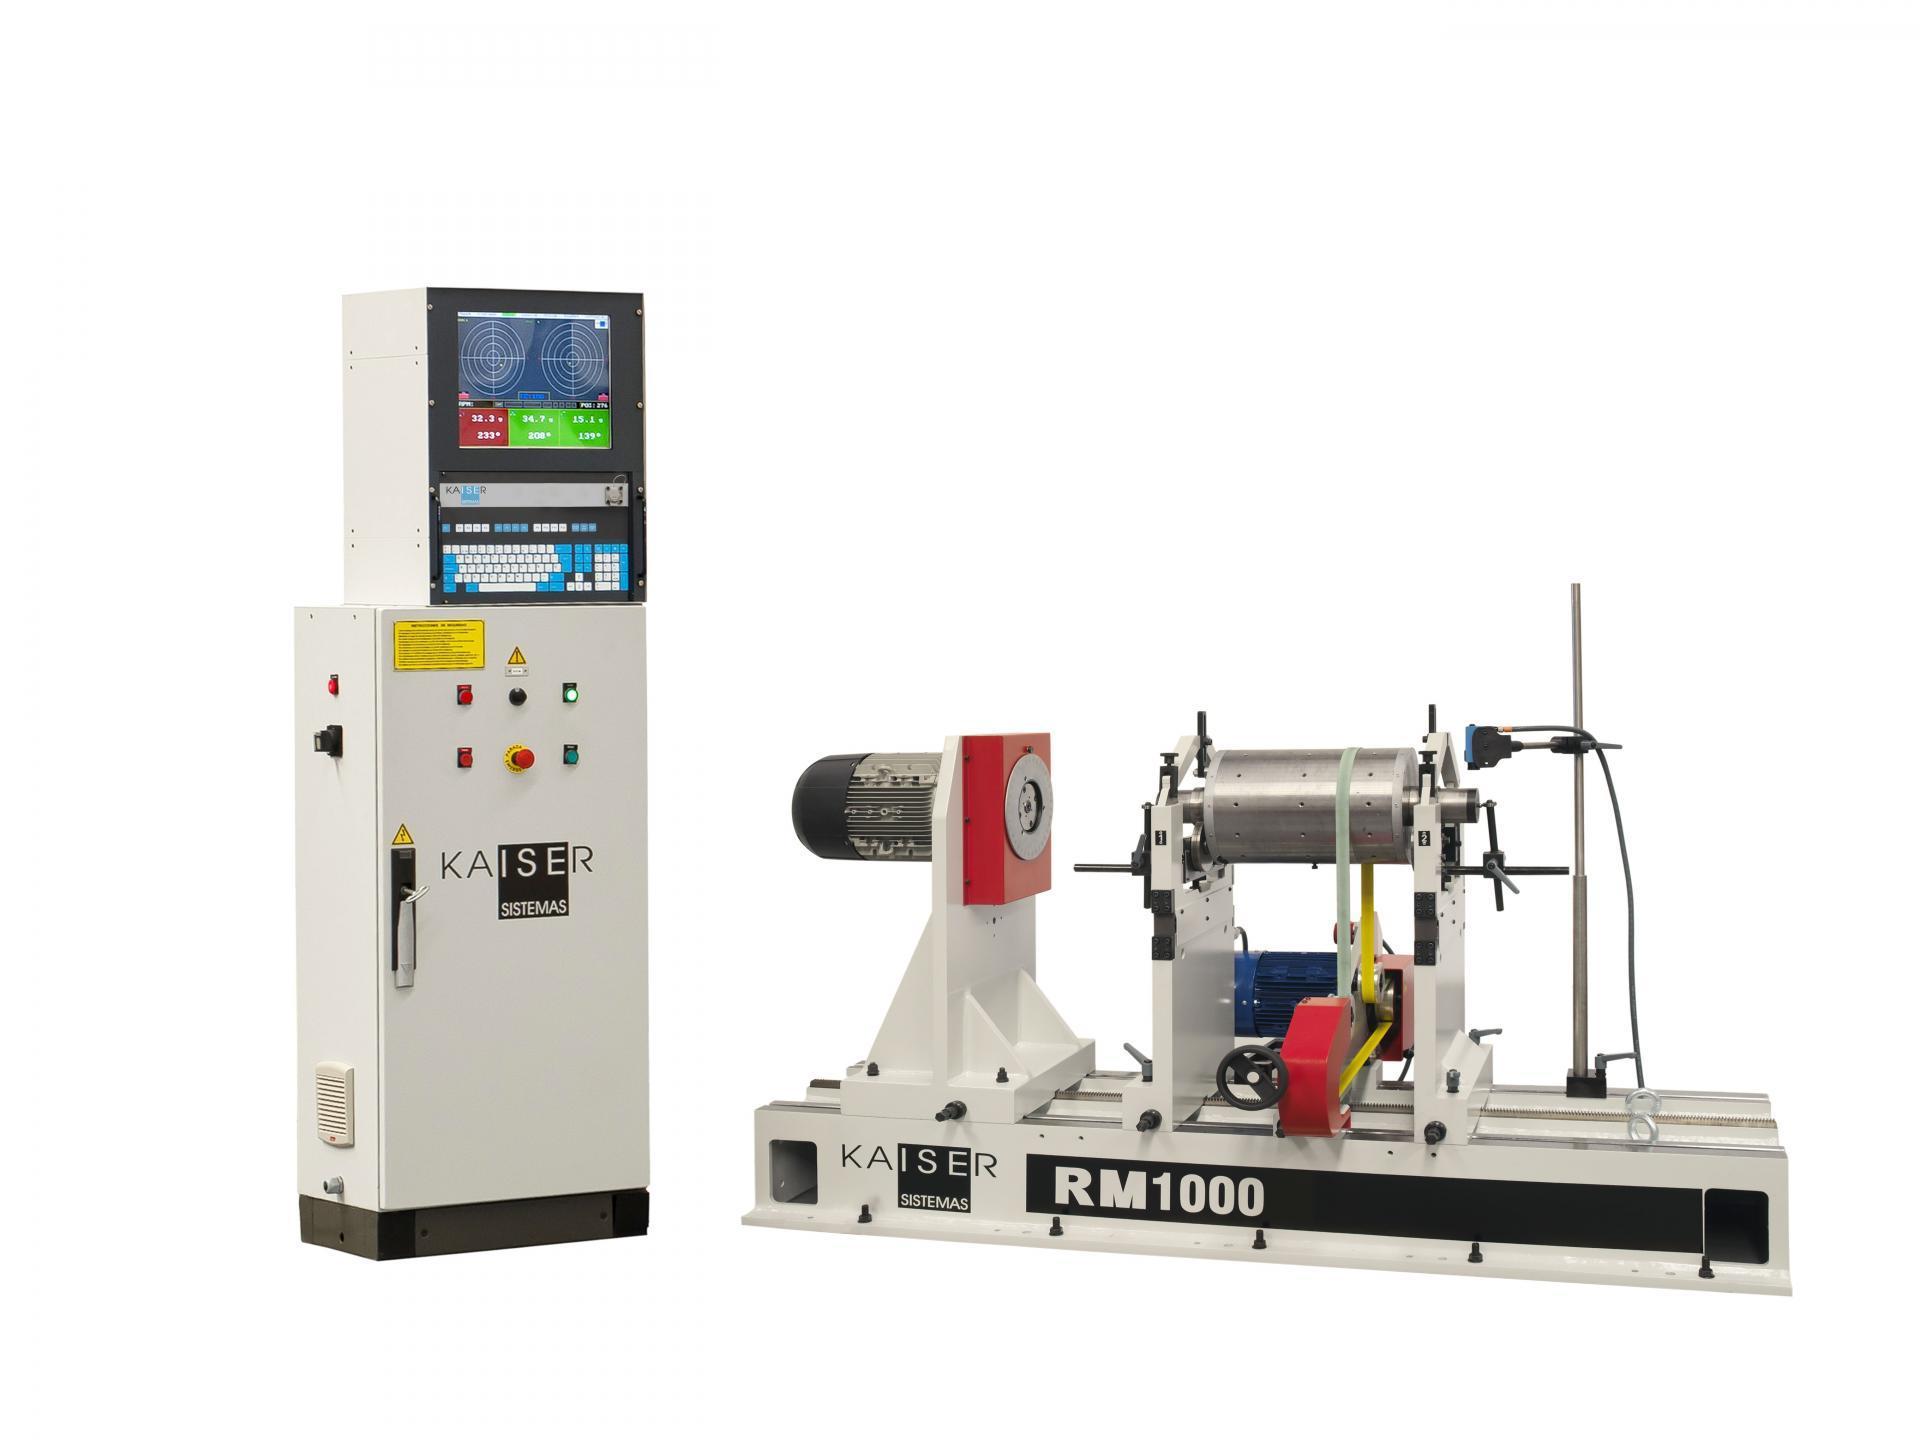 REF 08 - MODEL RM1000.3 HORIZONTAL BALANCING MACHINE